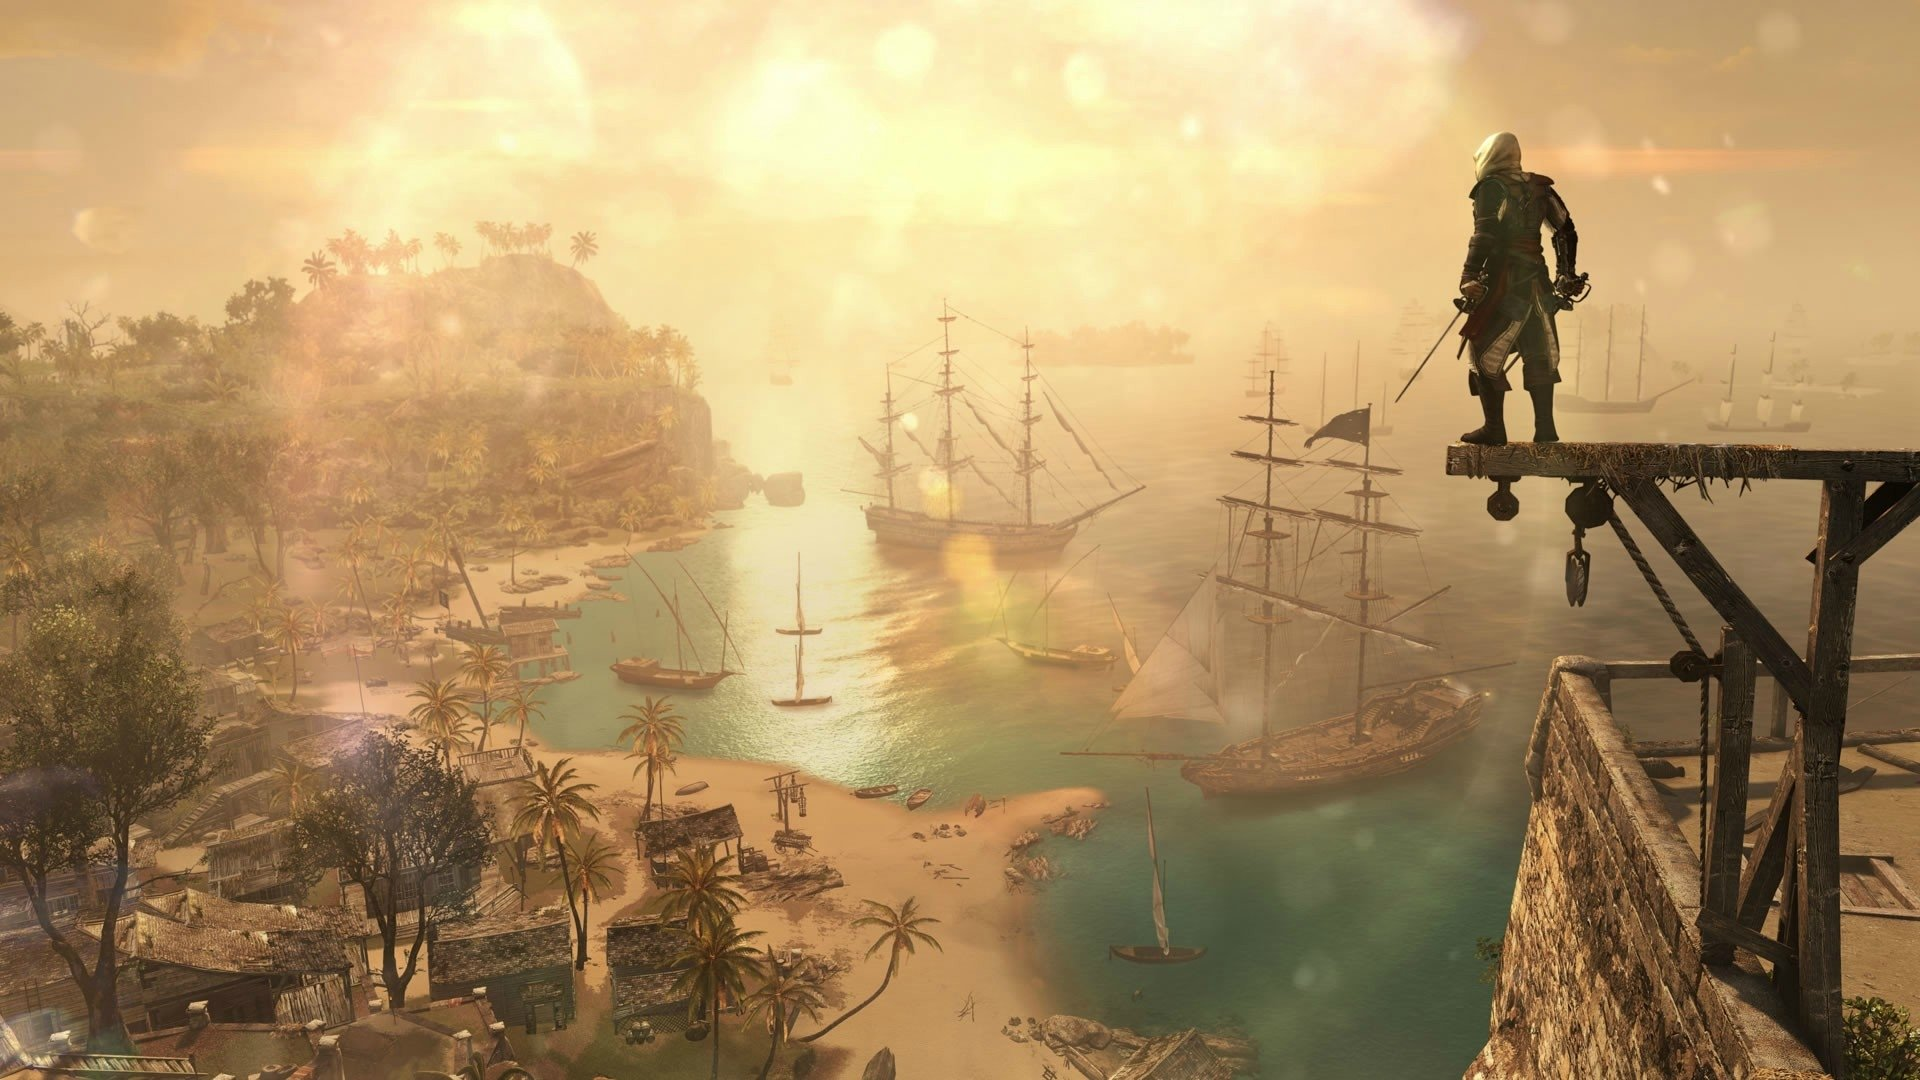 Кадр из Assassin's Creed IV. Источник: wall.alphacoders.com